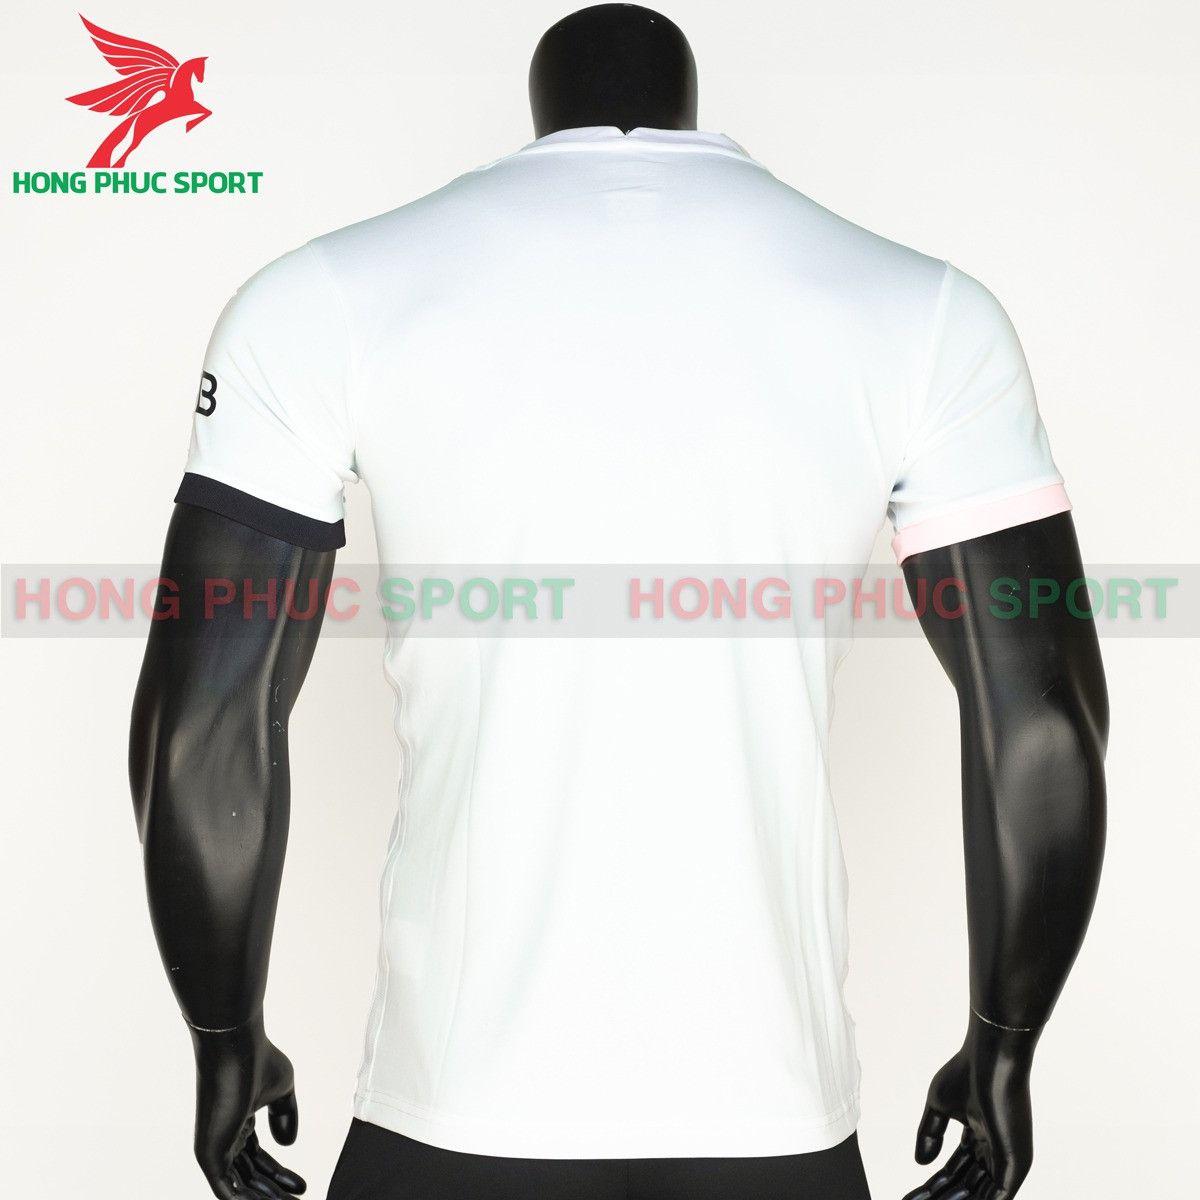 https://cdn.hongphucsport.com/unsafe/s4.shopbay.vn/files/285/ao-dau-psg-2021-2022-san-khach-thailand-6-6149b41a17e33.jpg